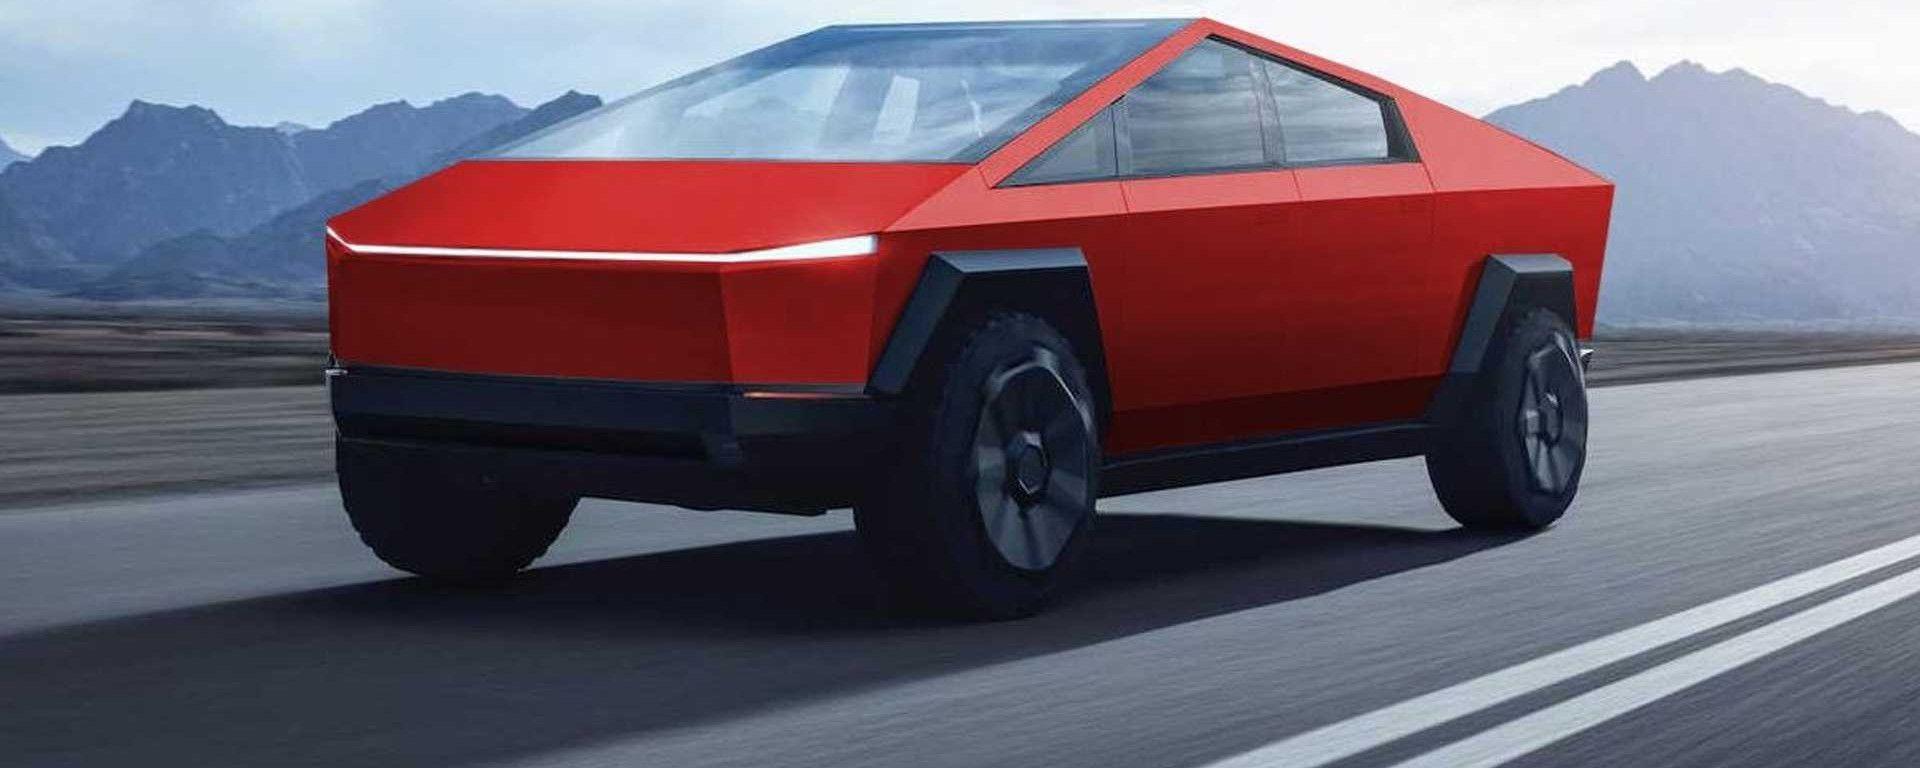 Tesla Cybertruck, come sarebbe rossa?